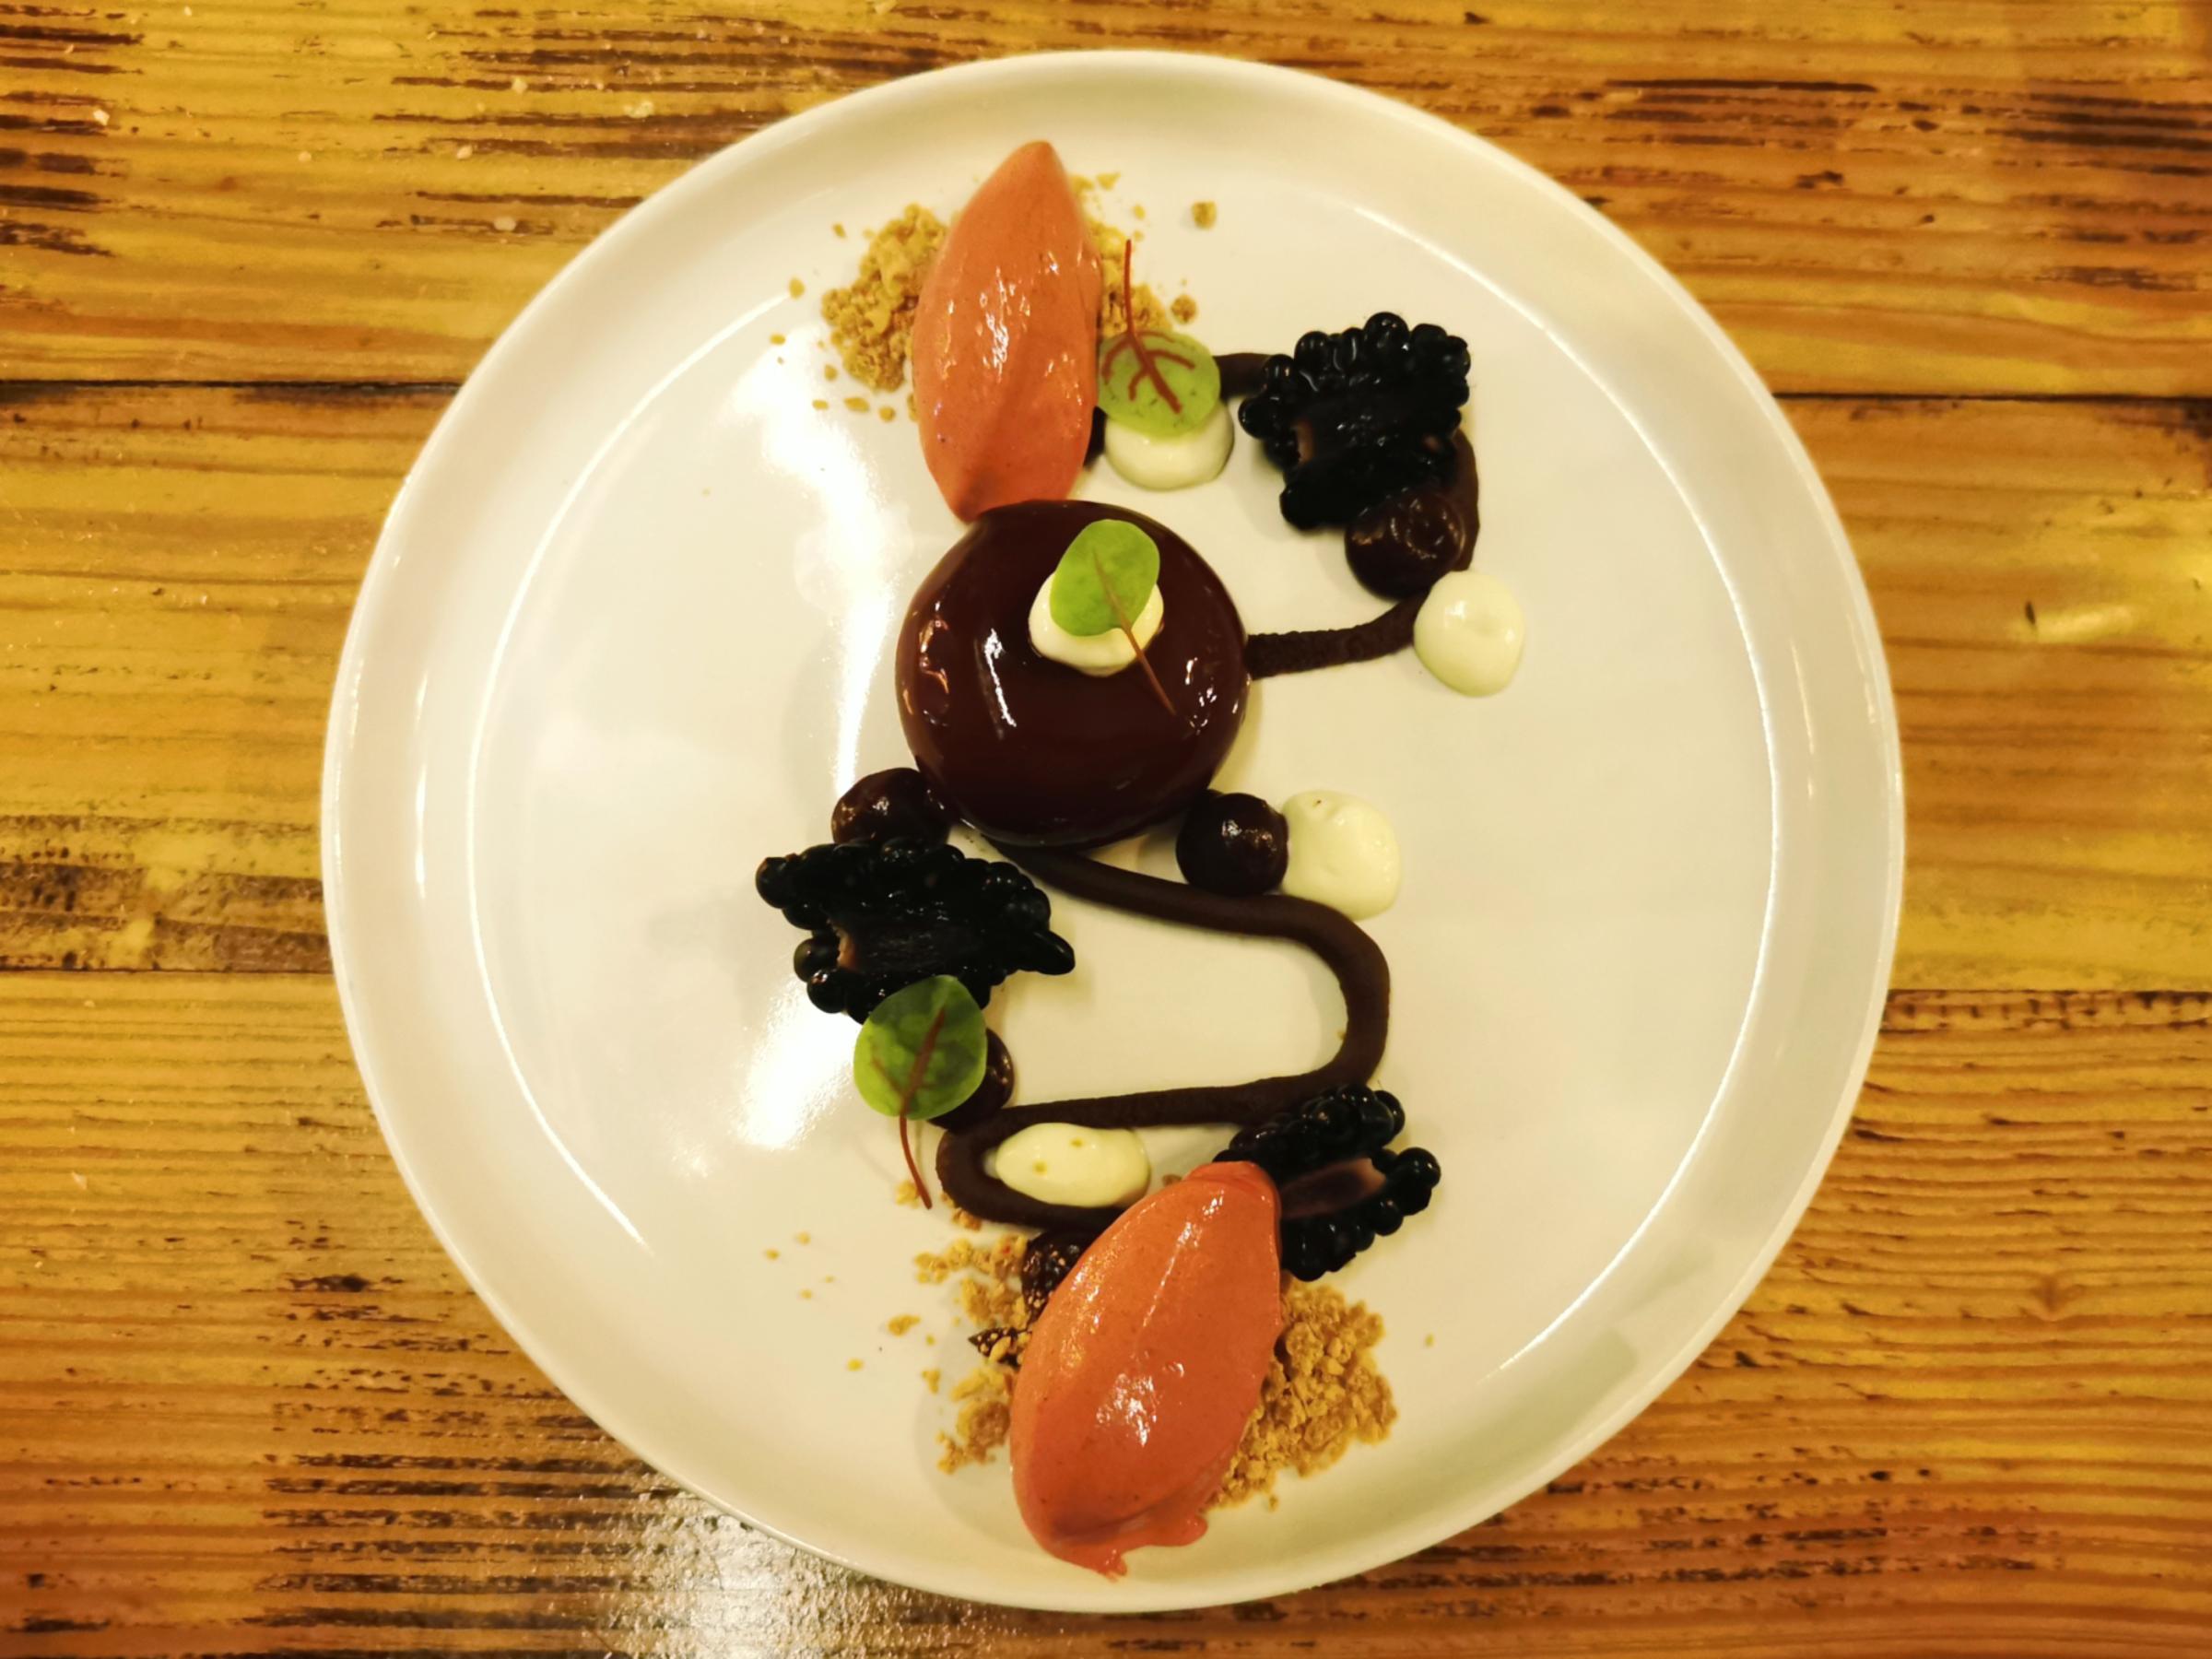 Restaurant Kosie Enschede Proef Eet menu 4